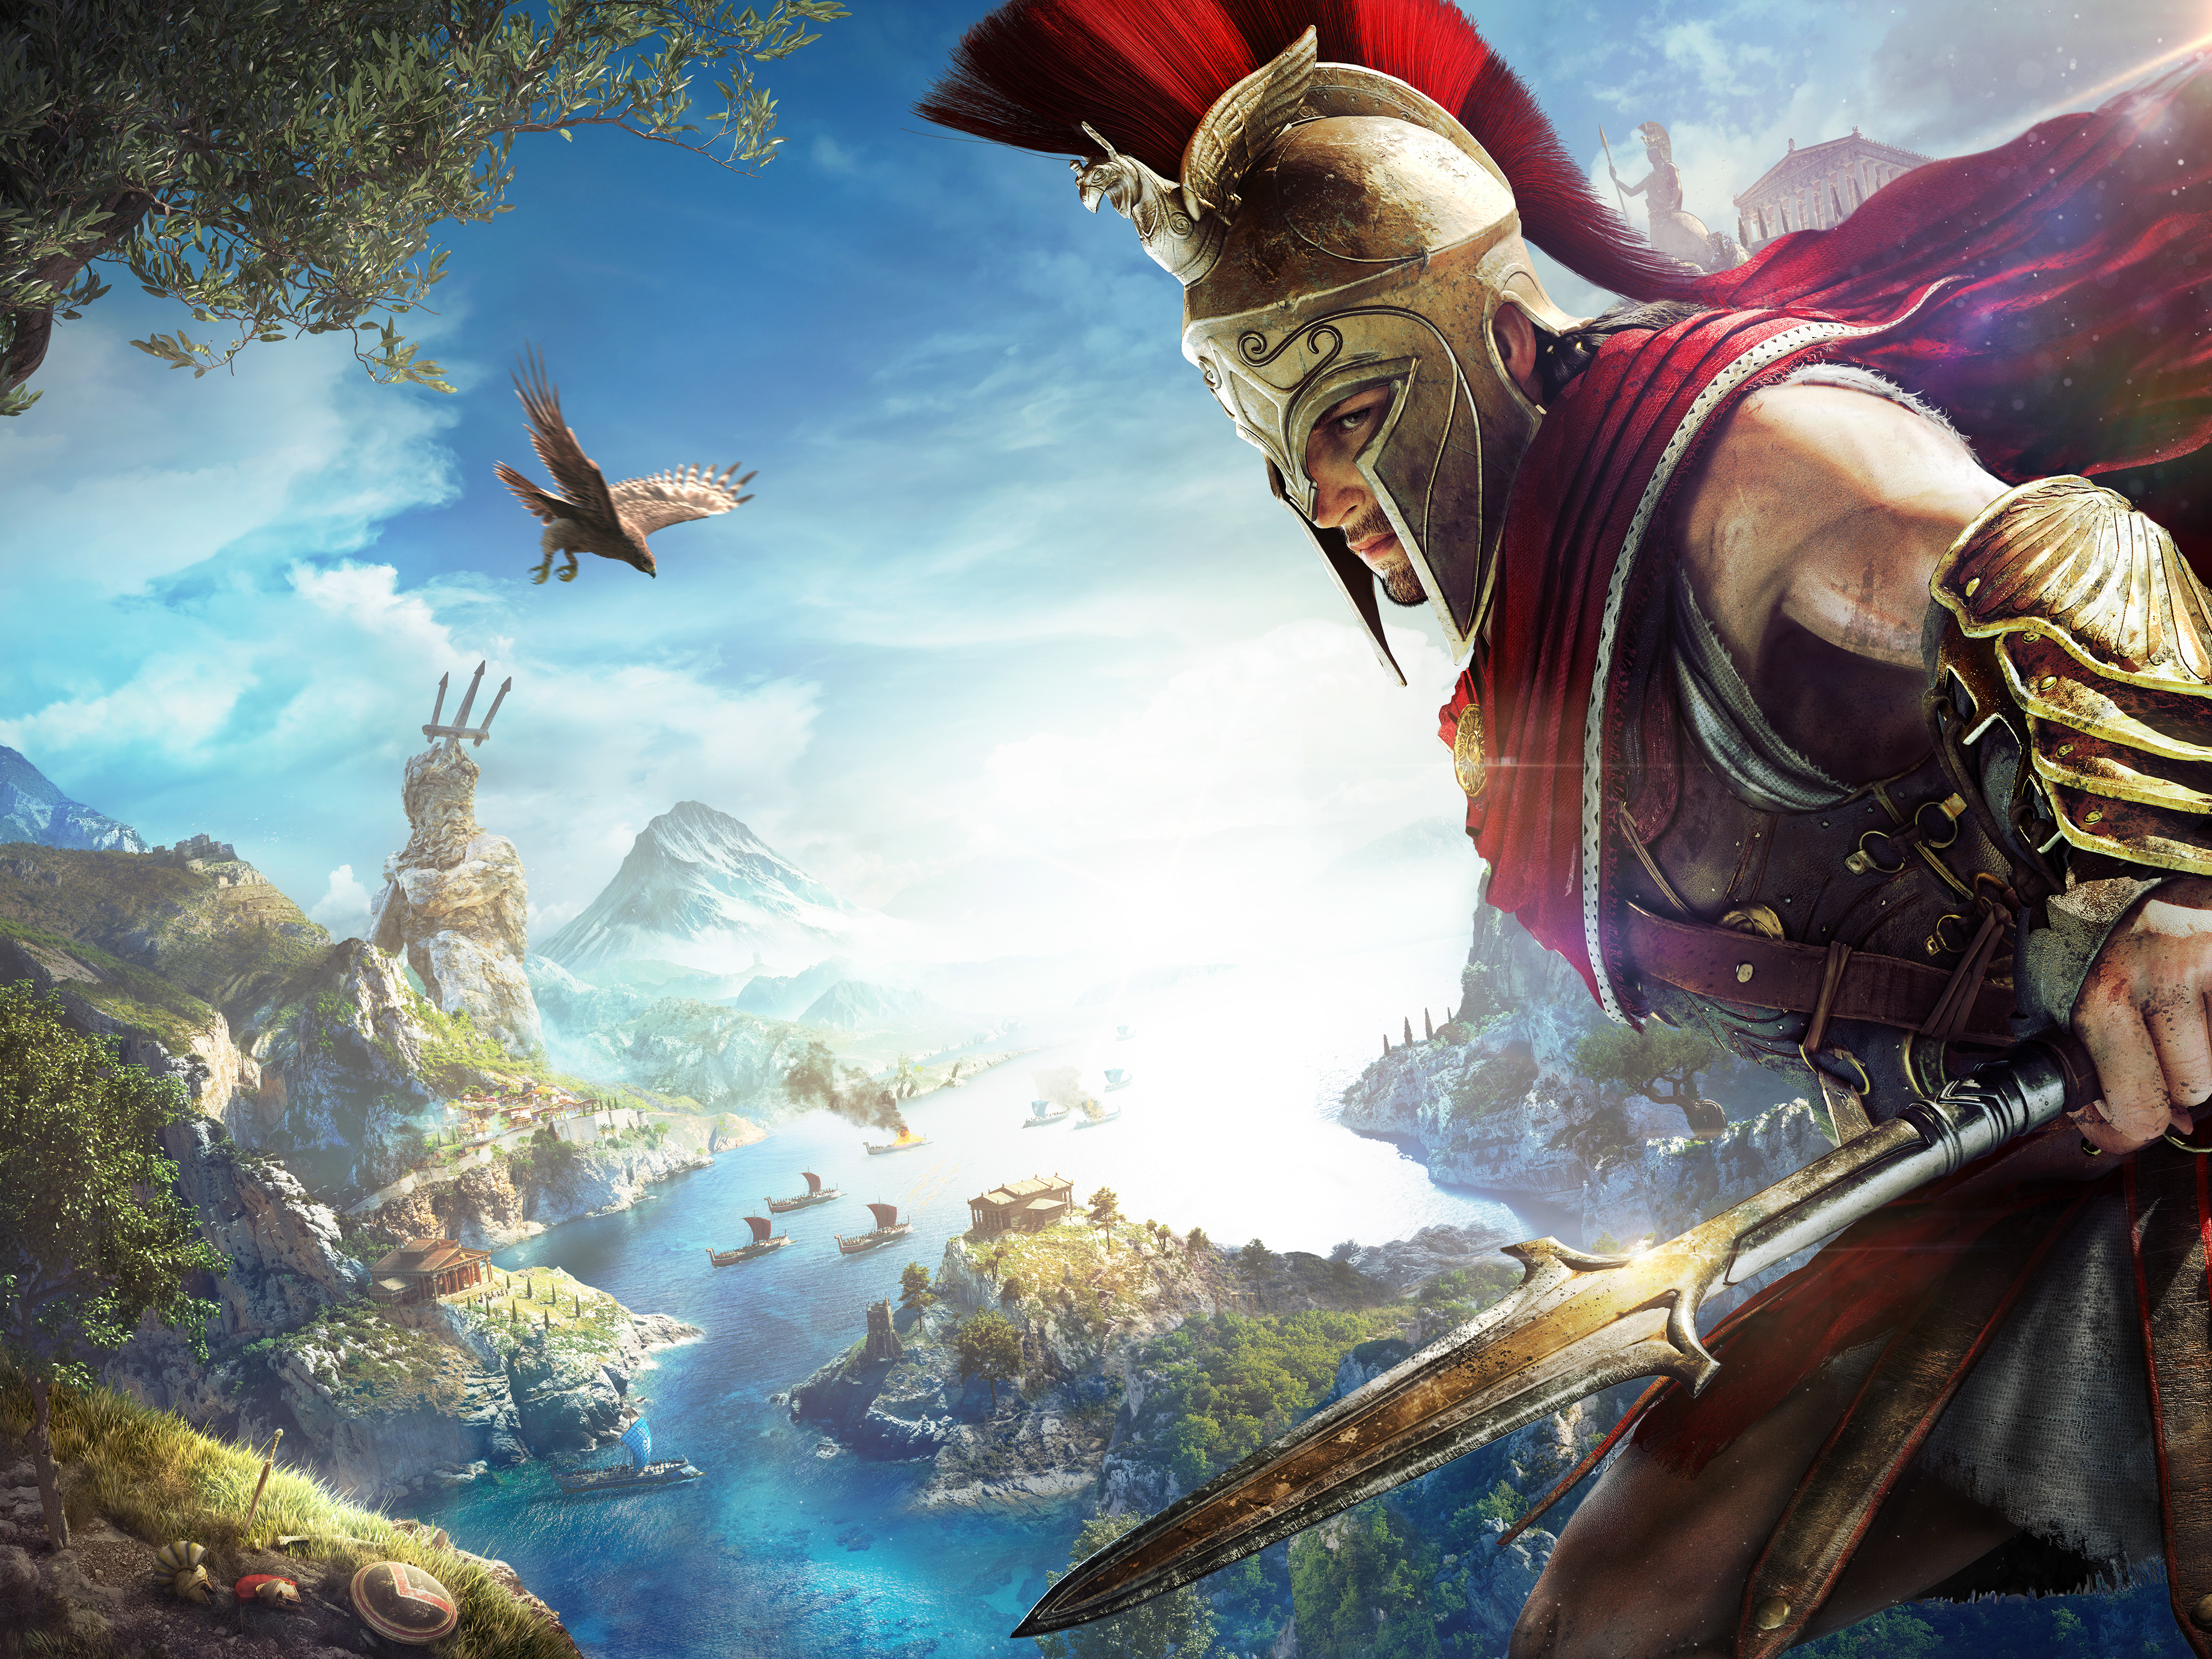 Assassins Creed Odyssey 4k Ultra Hd Wallpaper Background